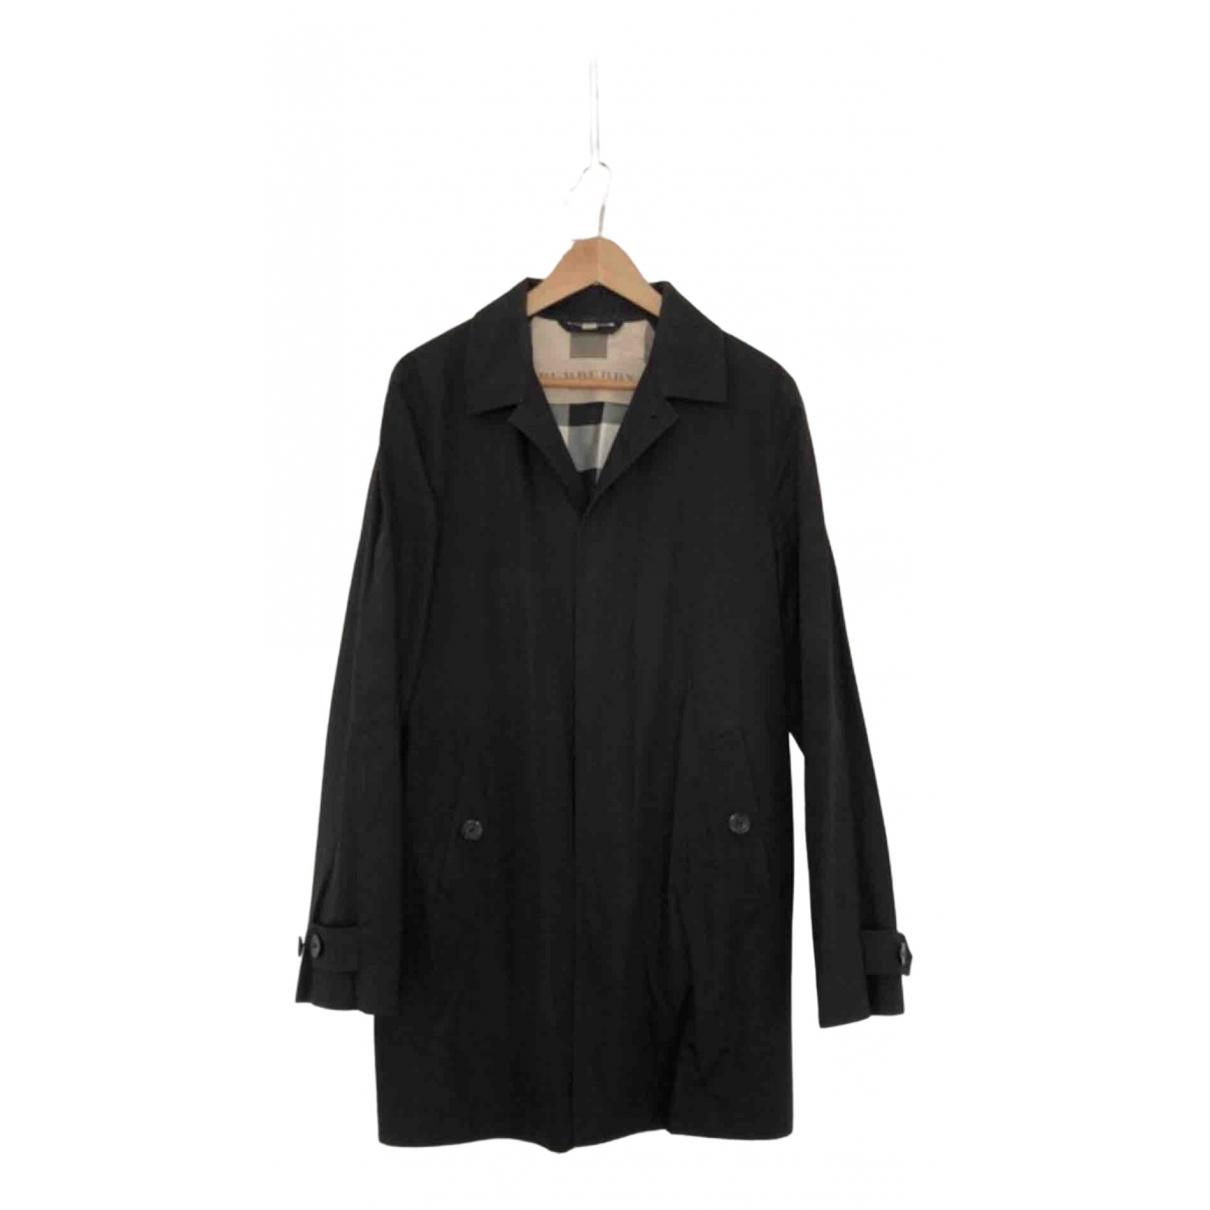 Burberry \N Black Cotton coat  for Men M International